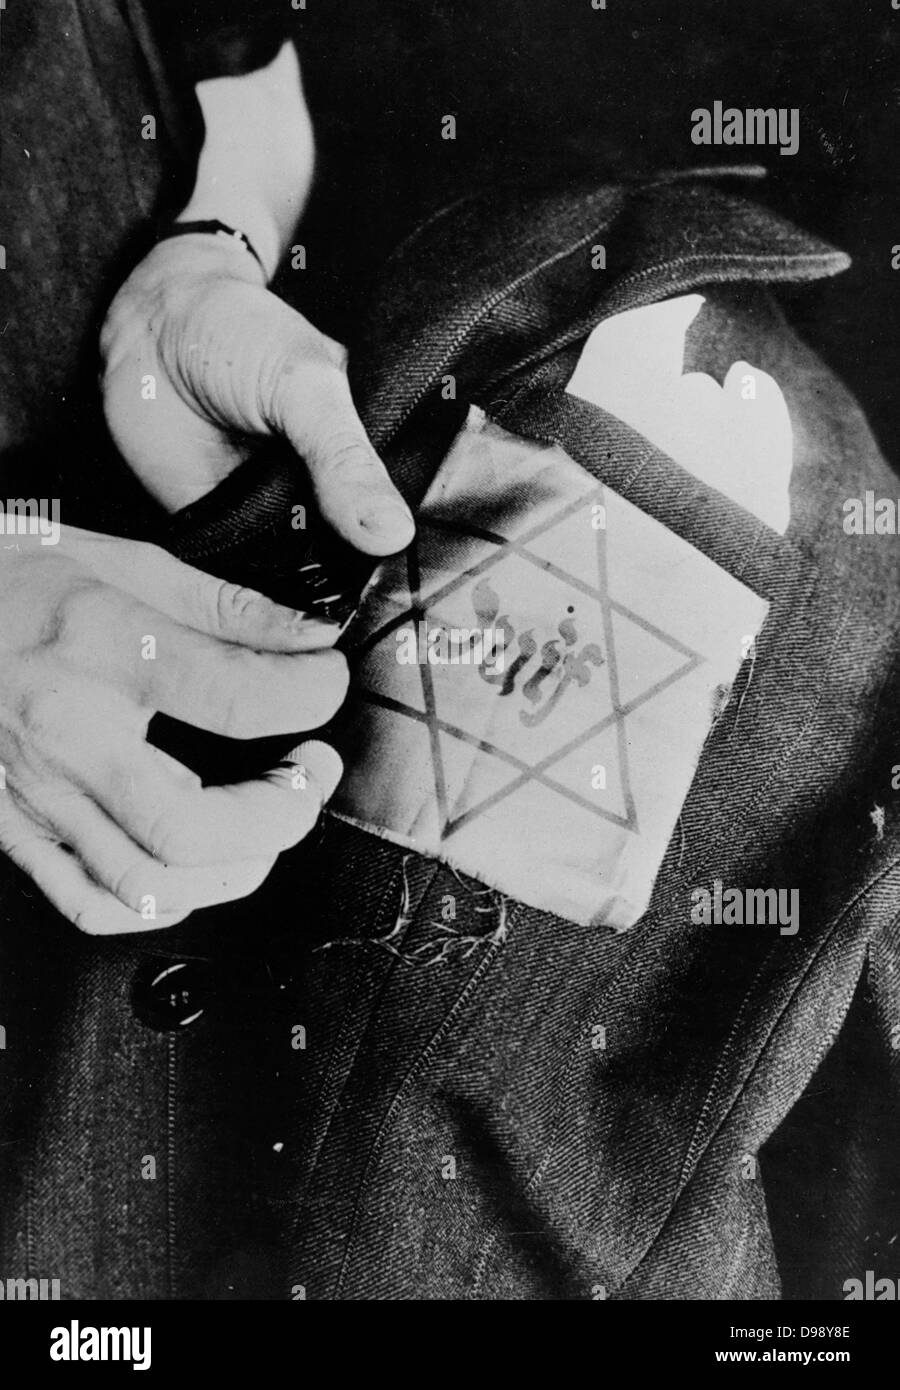 Yellow star badge worn by Jews in Nazi occupied Europe circa 1941 - Stock Image